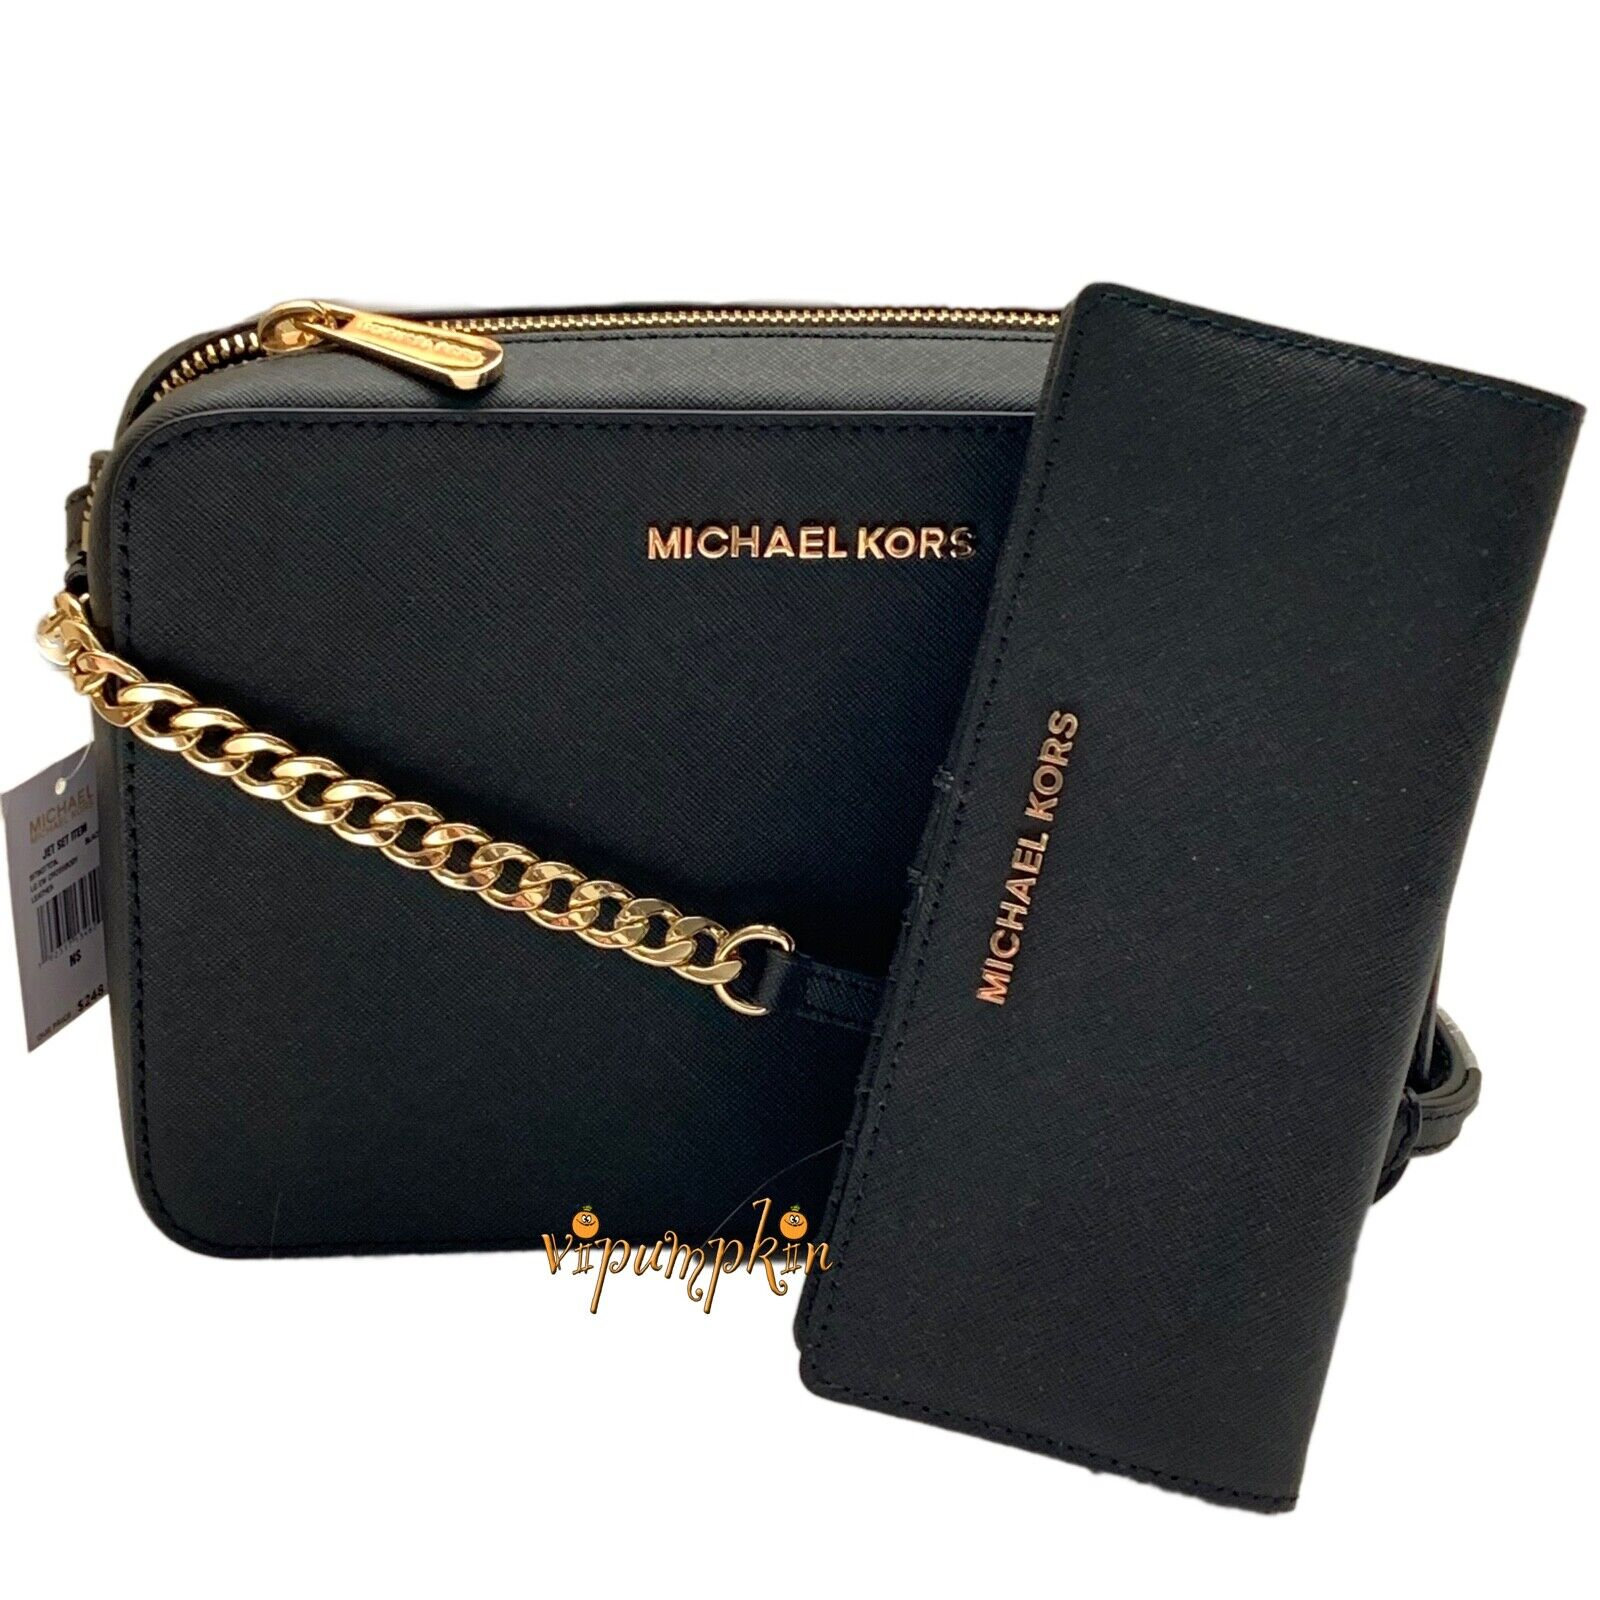 Michael Kors Jet Set Item Crossbody Bag Wallet Set Saffiano Leather Black